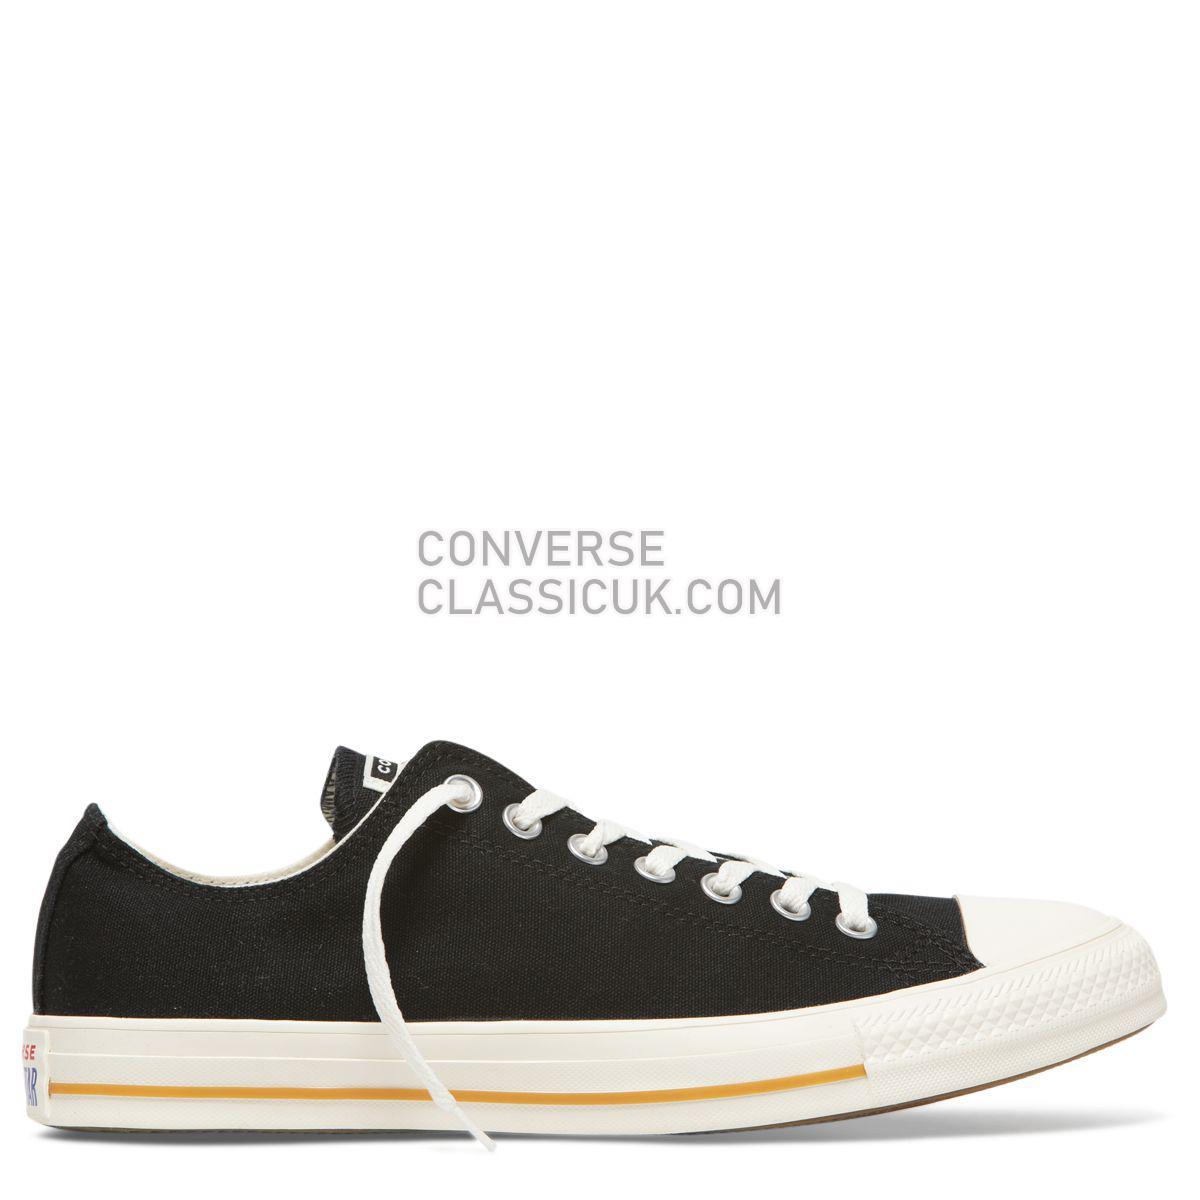 Converse Chuck Taylor All Star Cali Wash Low Top Black Mens Womens Unisex 165691 Black/Egret/Egret Shoes